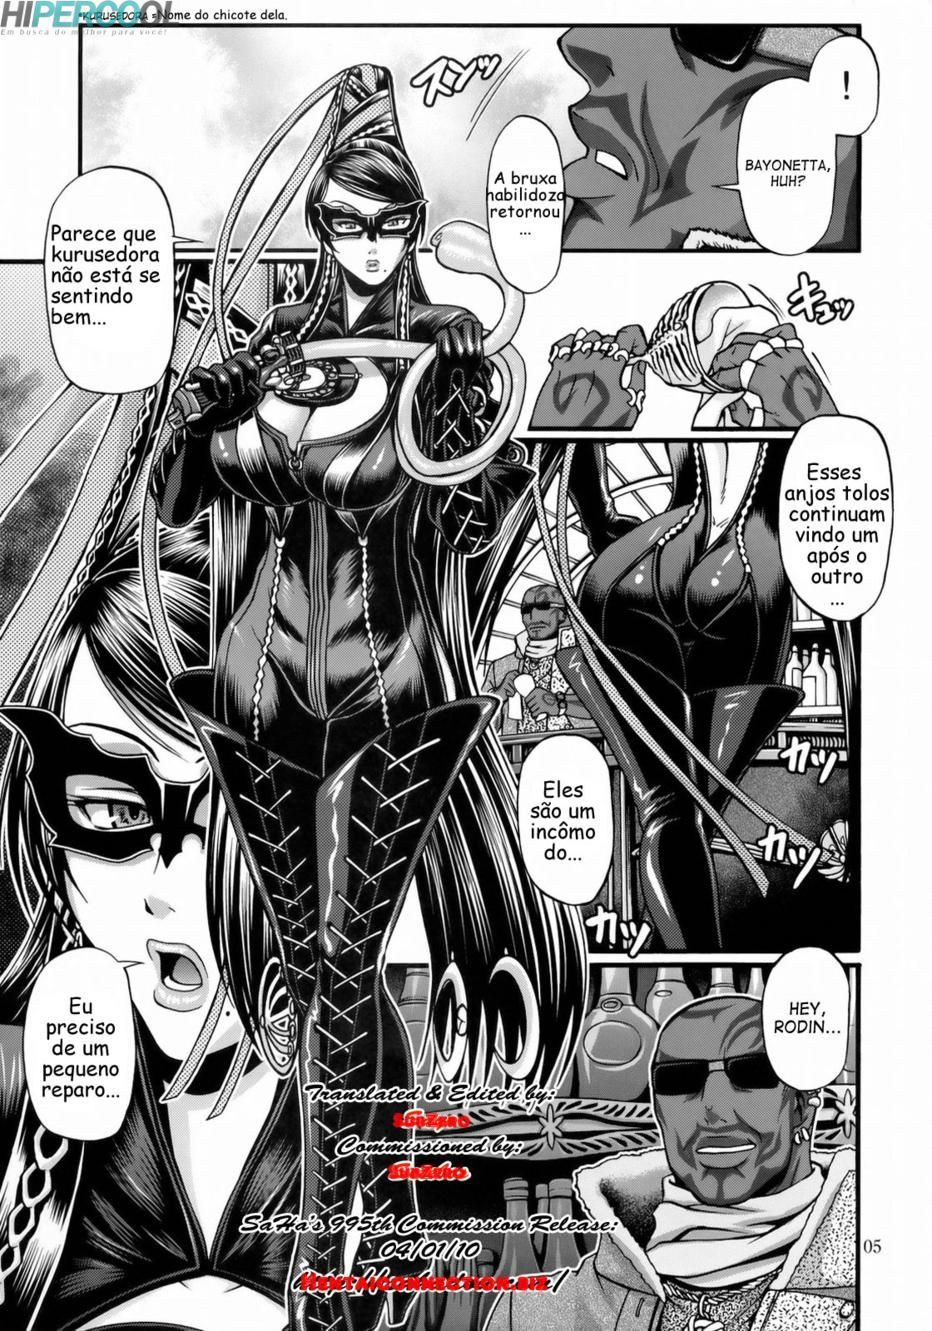 Bayonetta-hentai-Home-4